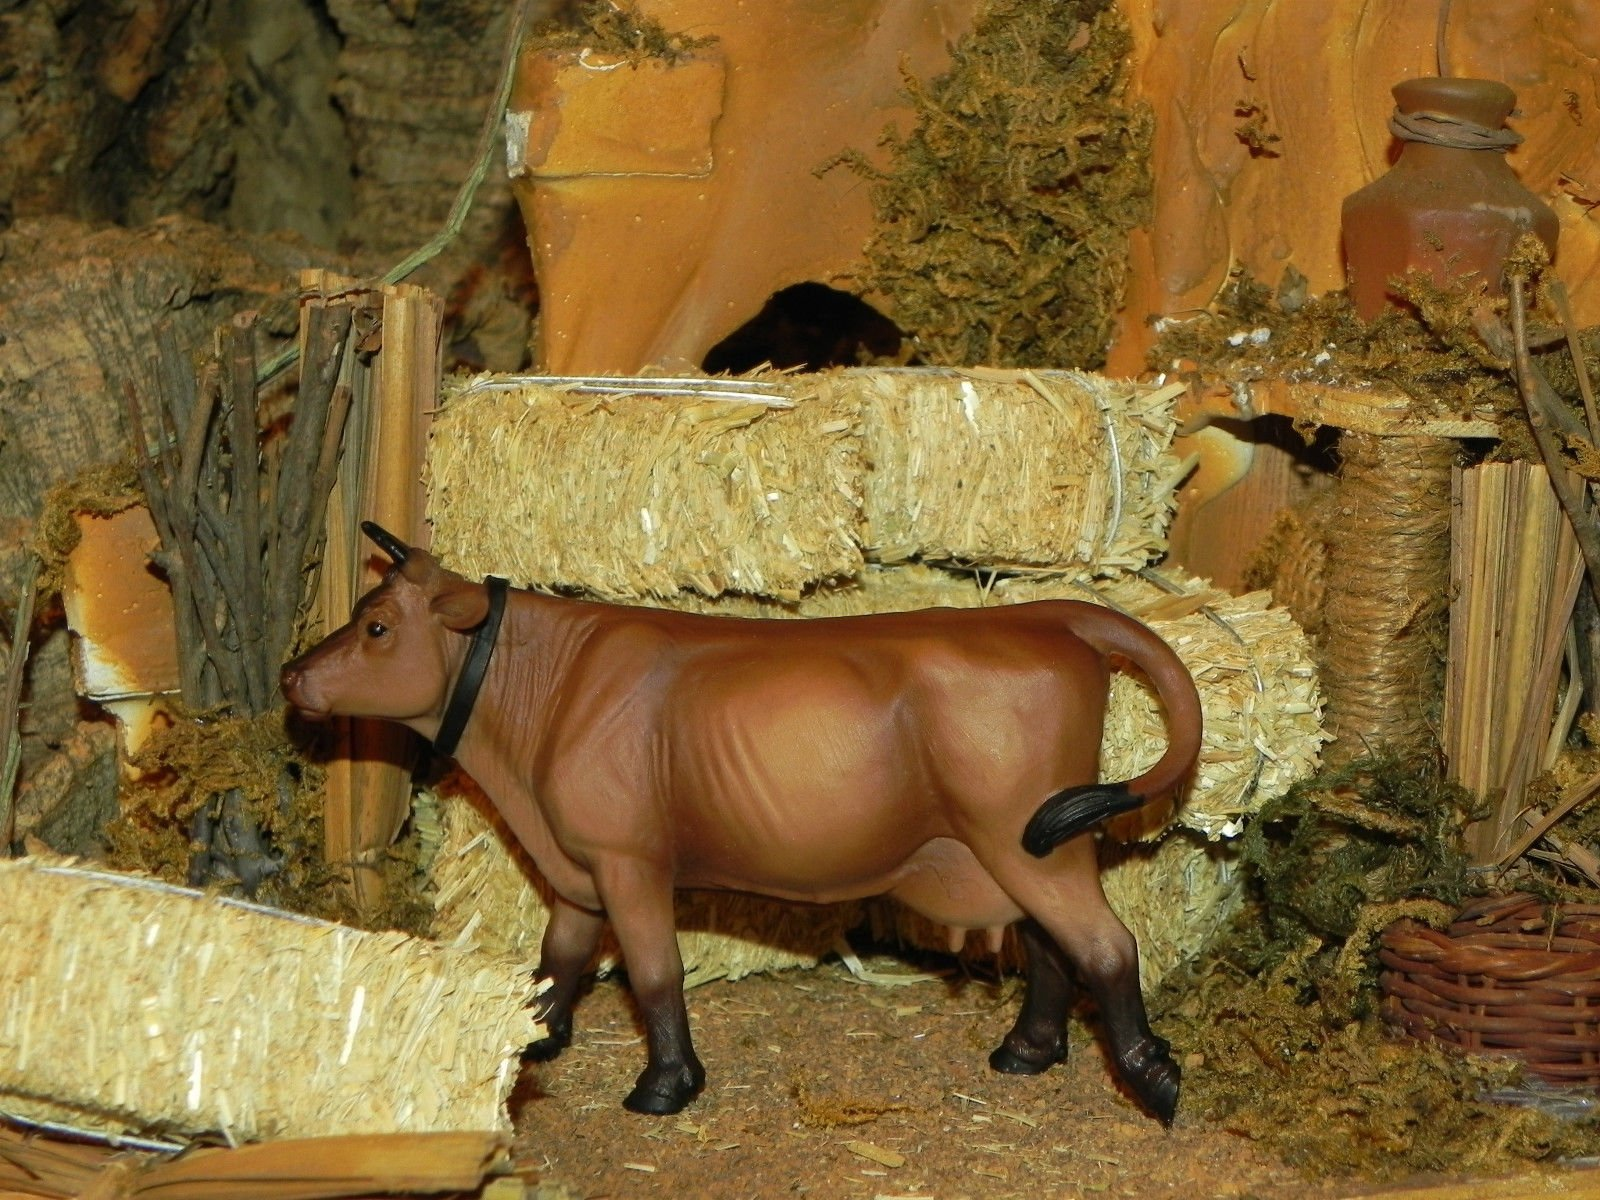 Collectible Animal Figurine Cow Nativity Scene 3.5'' Farm Figure - USA_Mall